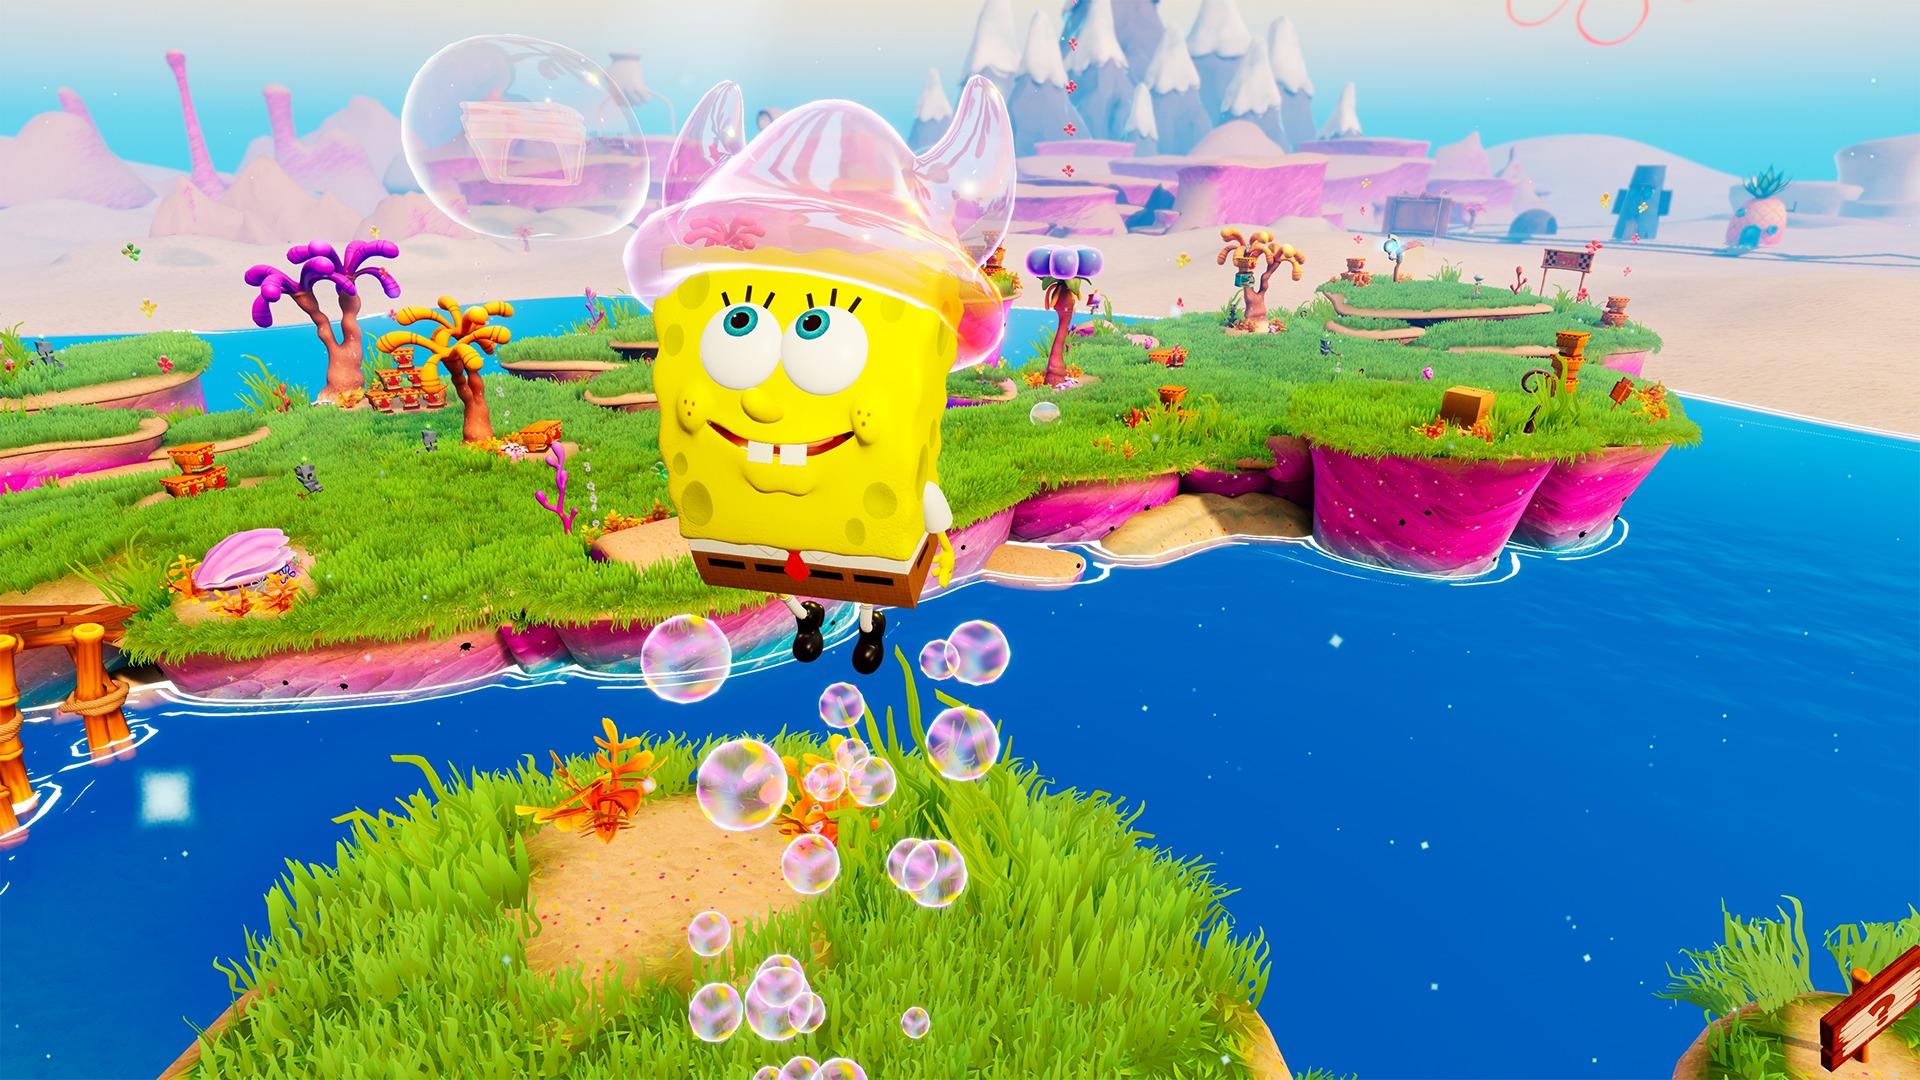 Game image SpongeBob SquarePants Battle for Bikini Bottom